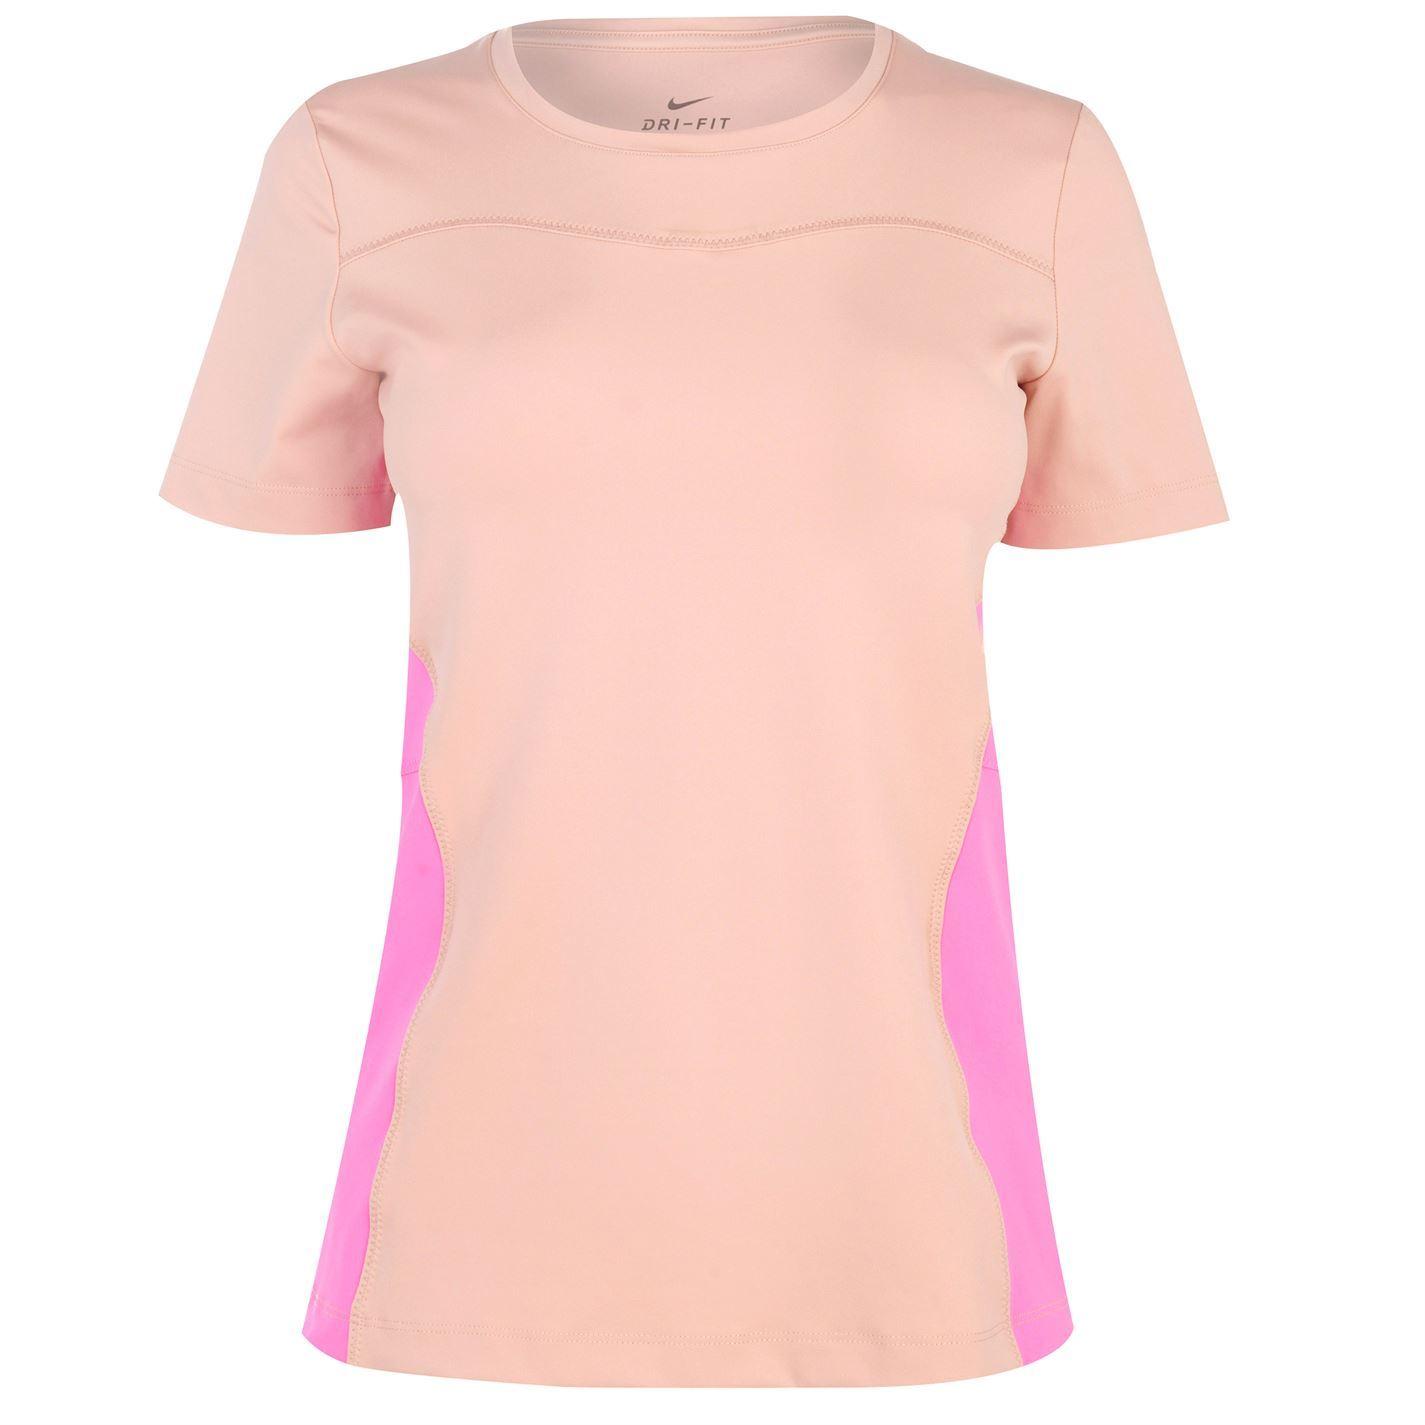 Detalles de Nike Dri Fit Sports Camiseta Oro Rosa Mujer Entrenamiento Físico